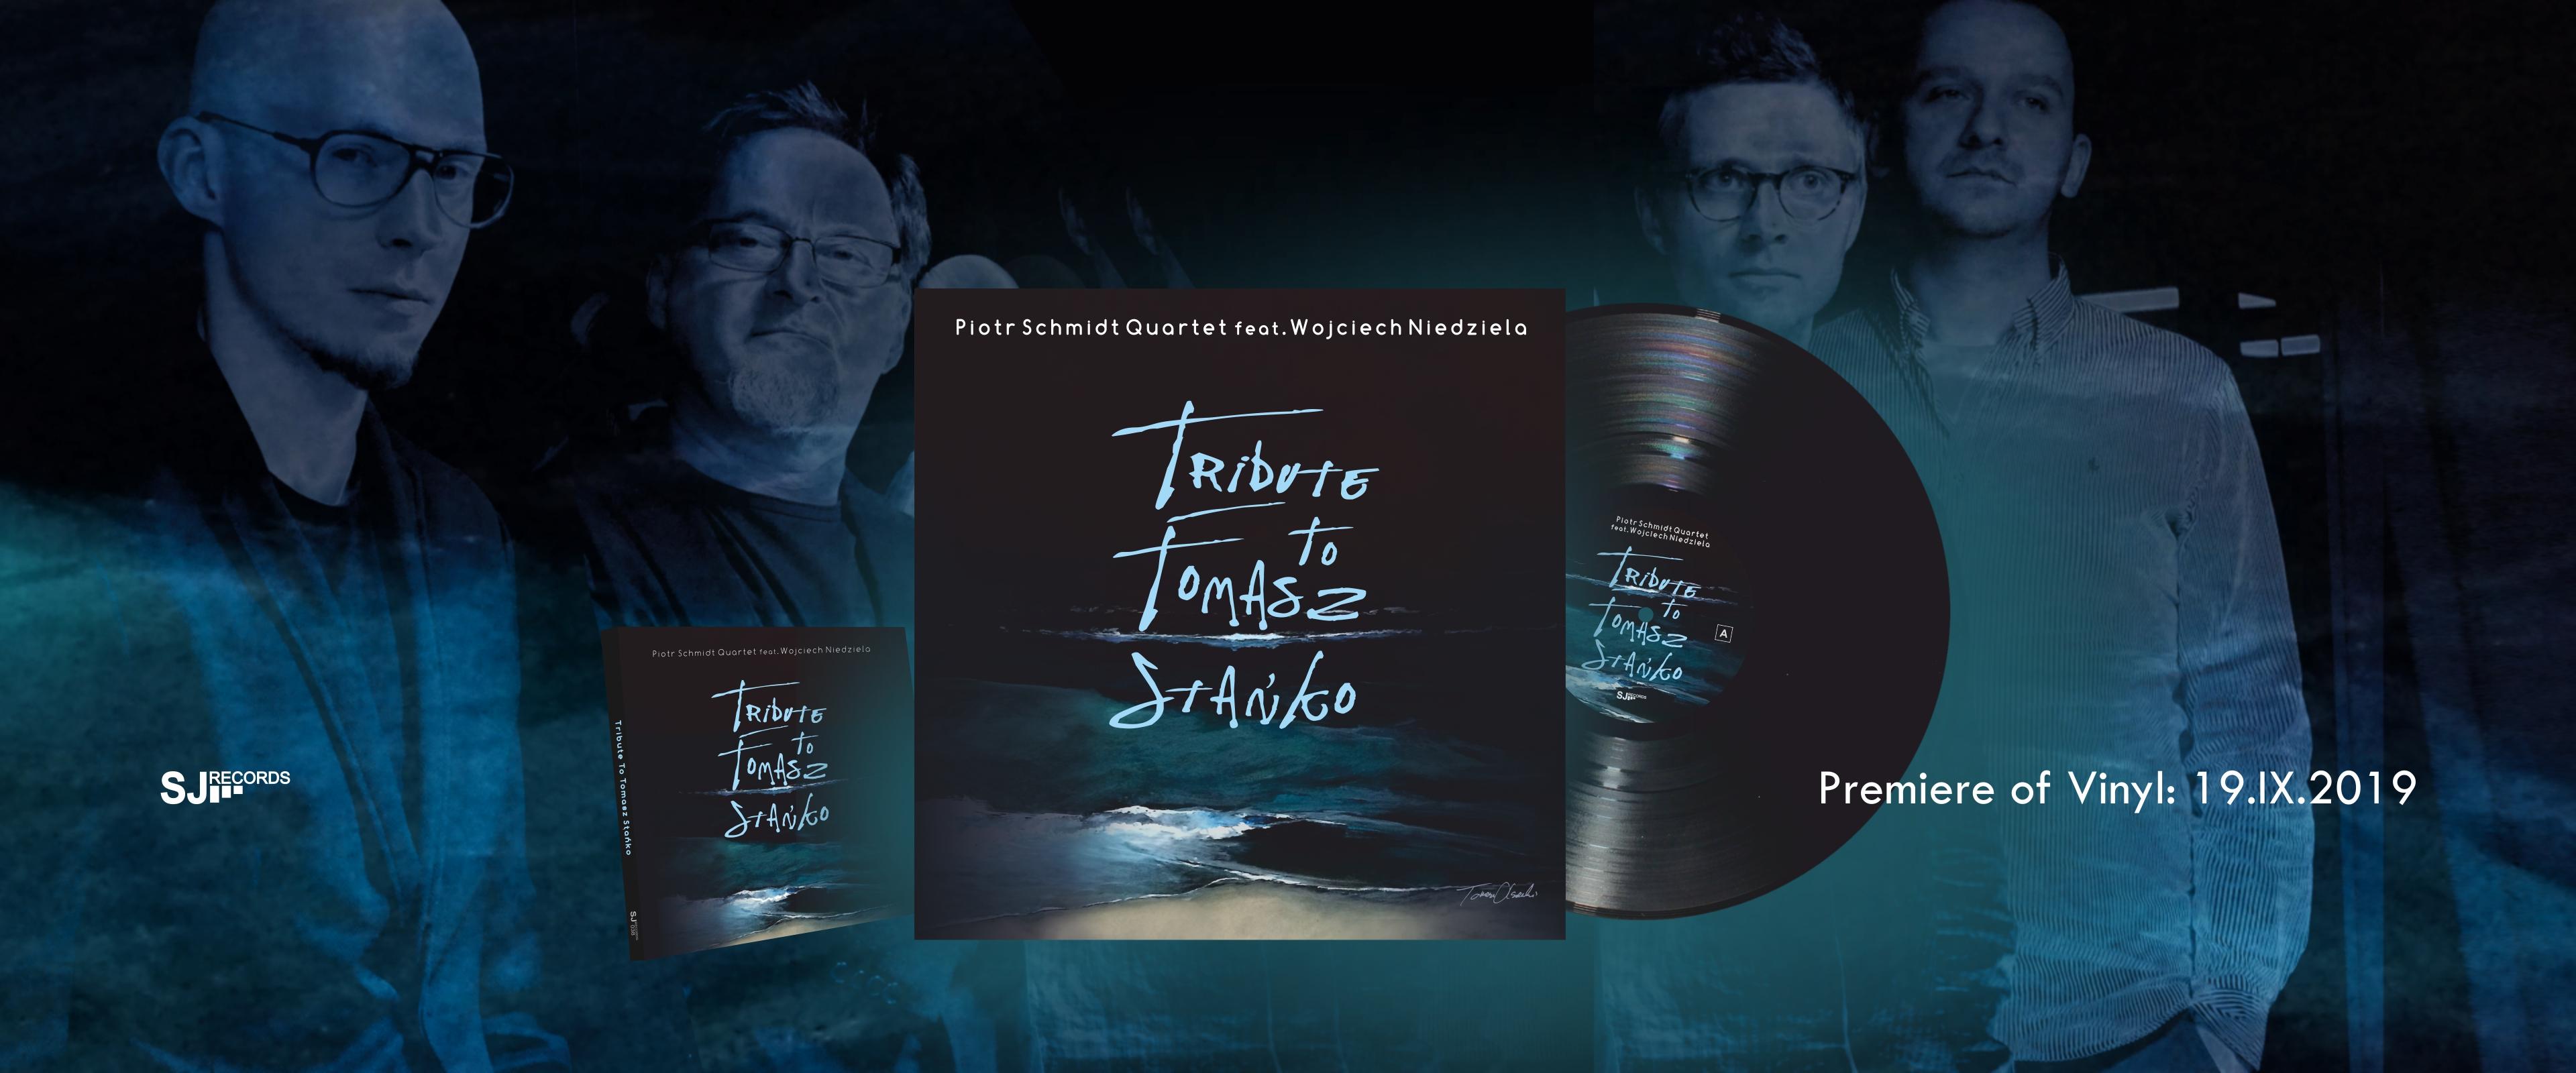 Piotr Schmidt Quartet - winyl - Tribute to Tomasz Stańko